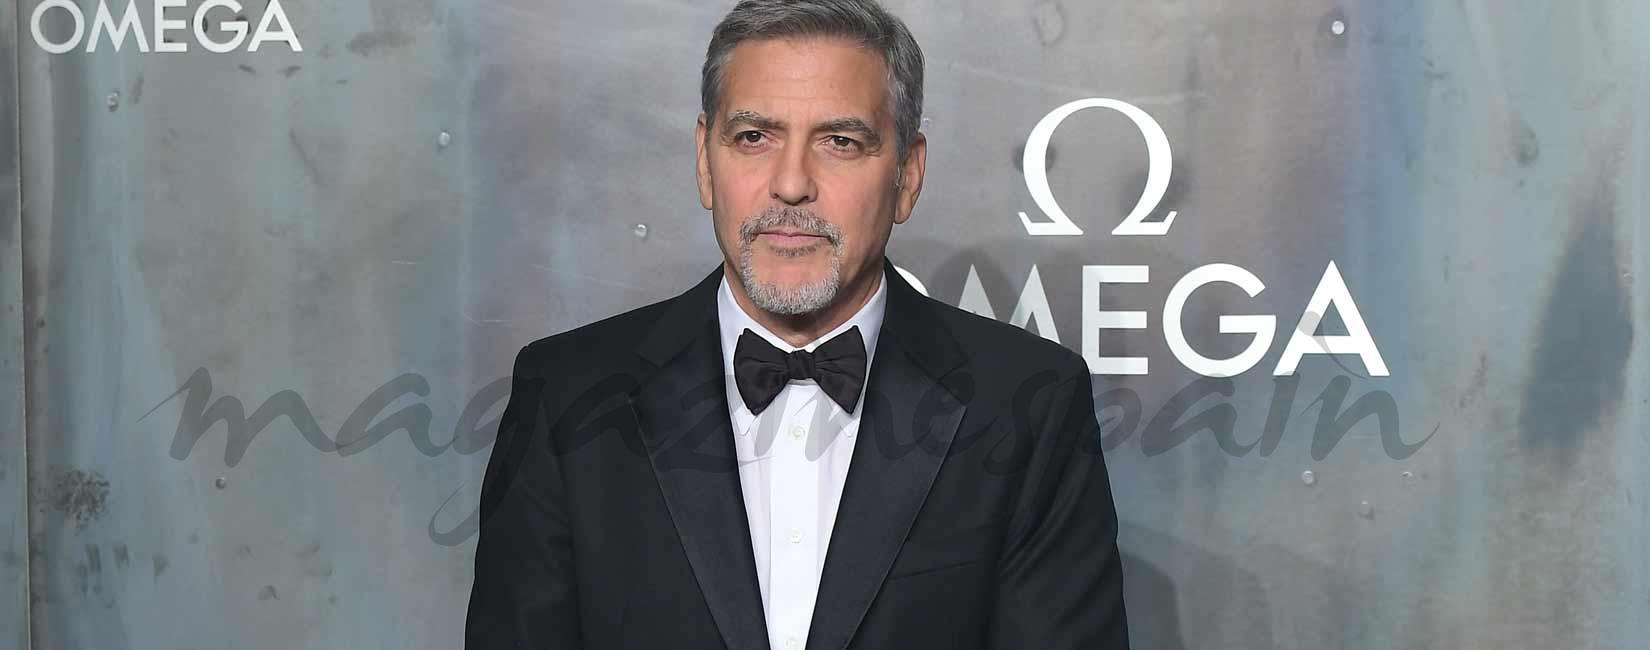 George Clooney, un elegante futuro papá